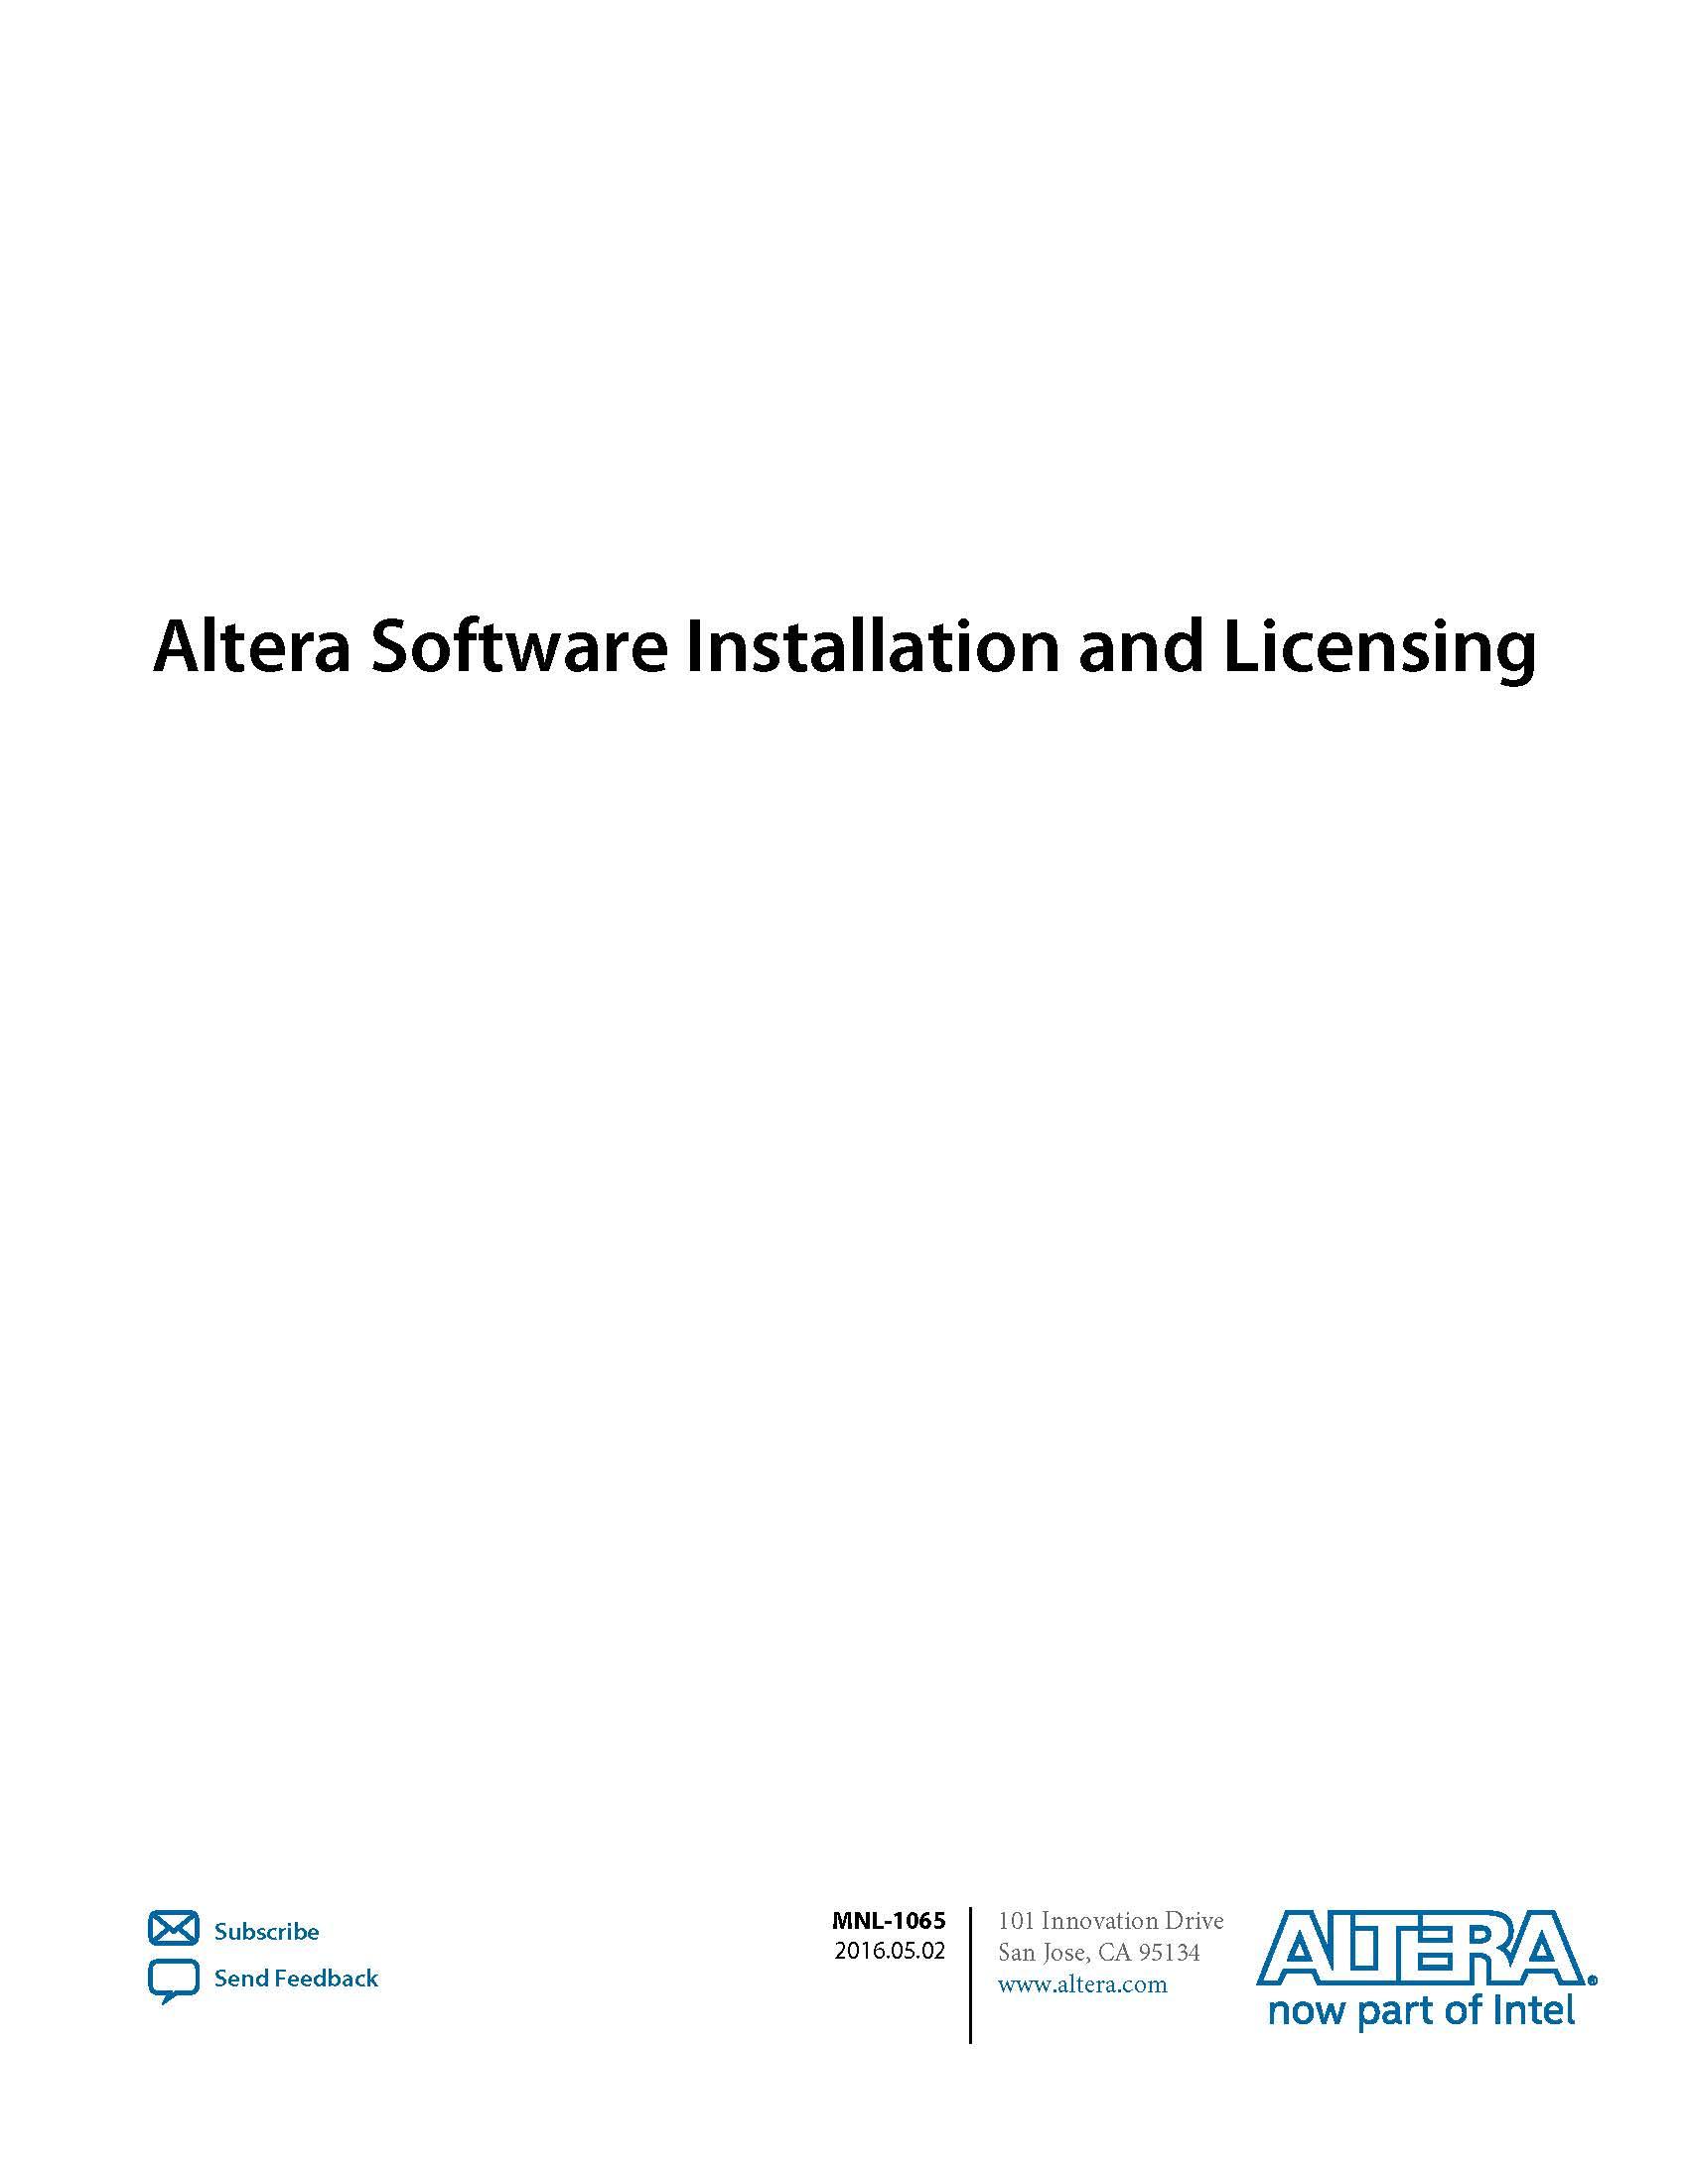 folatinglicense 设置quartus_install